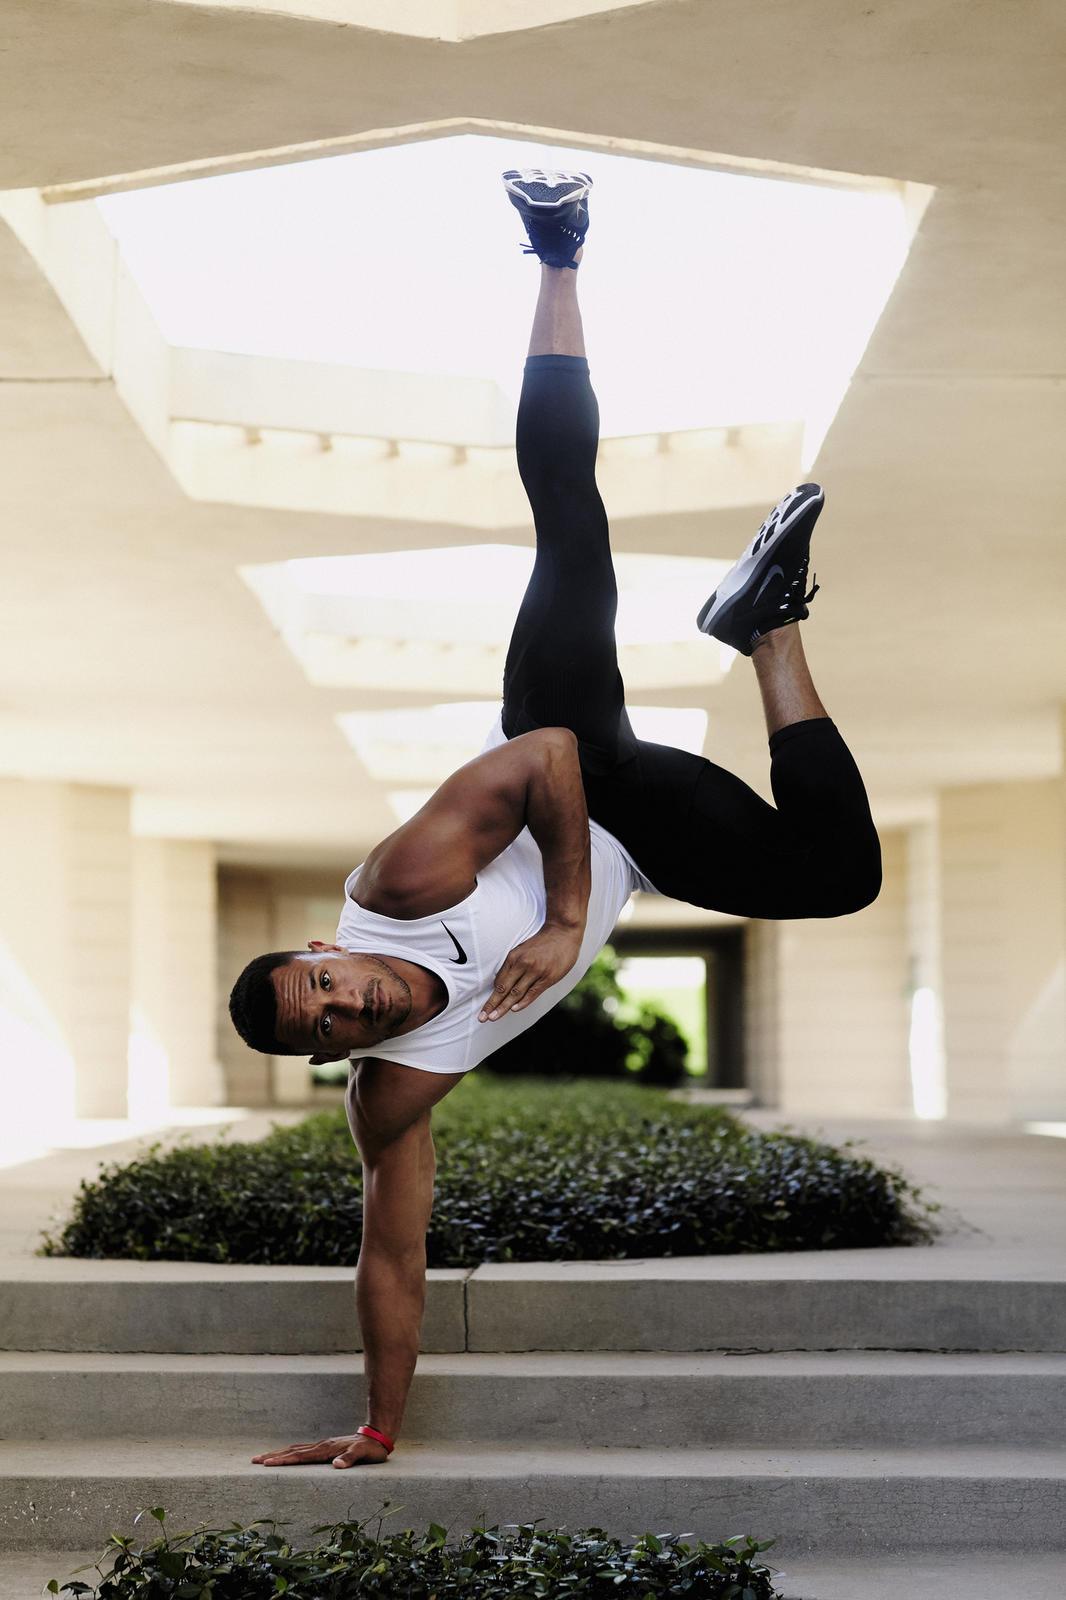 Nike Offers Free Yoga Workouts Anywhere, Anytime - Nike News